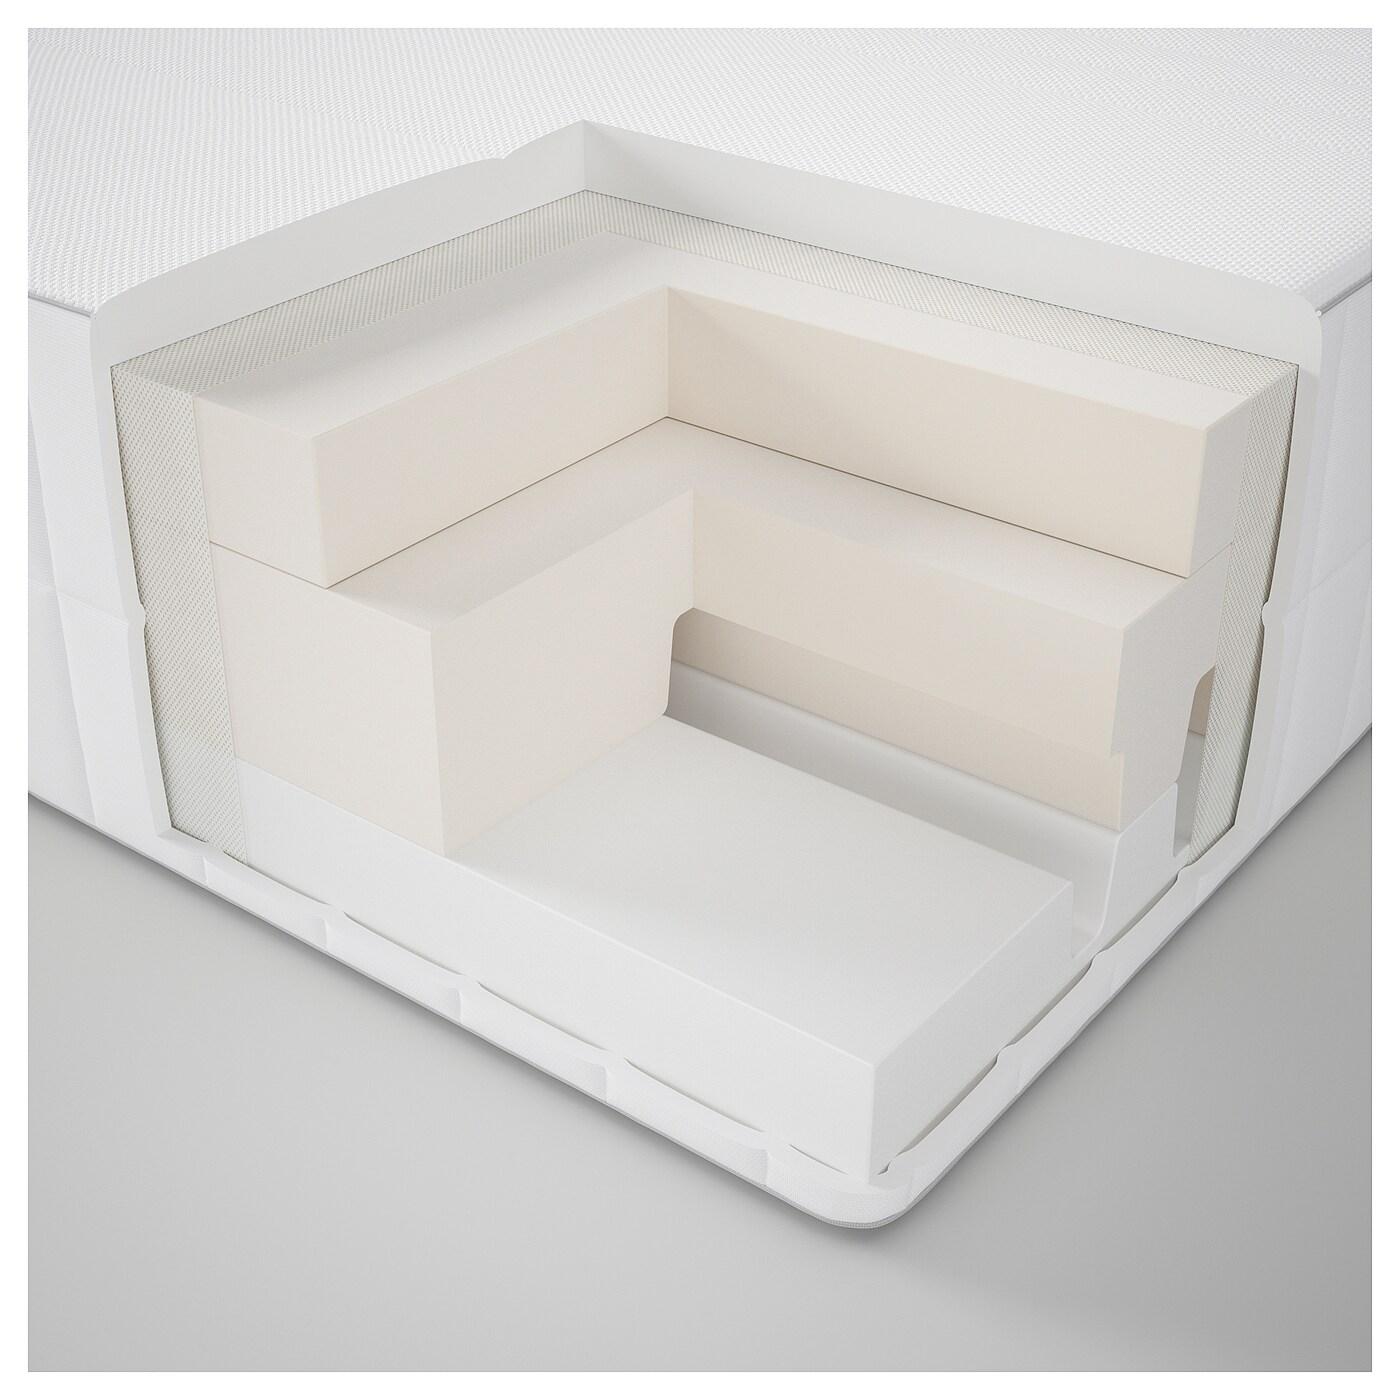 Myrbacka colch n espuma viscoel stica firme blanco 160 x for Sobre colchon ikea